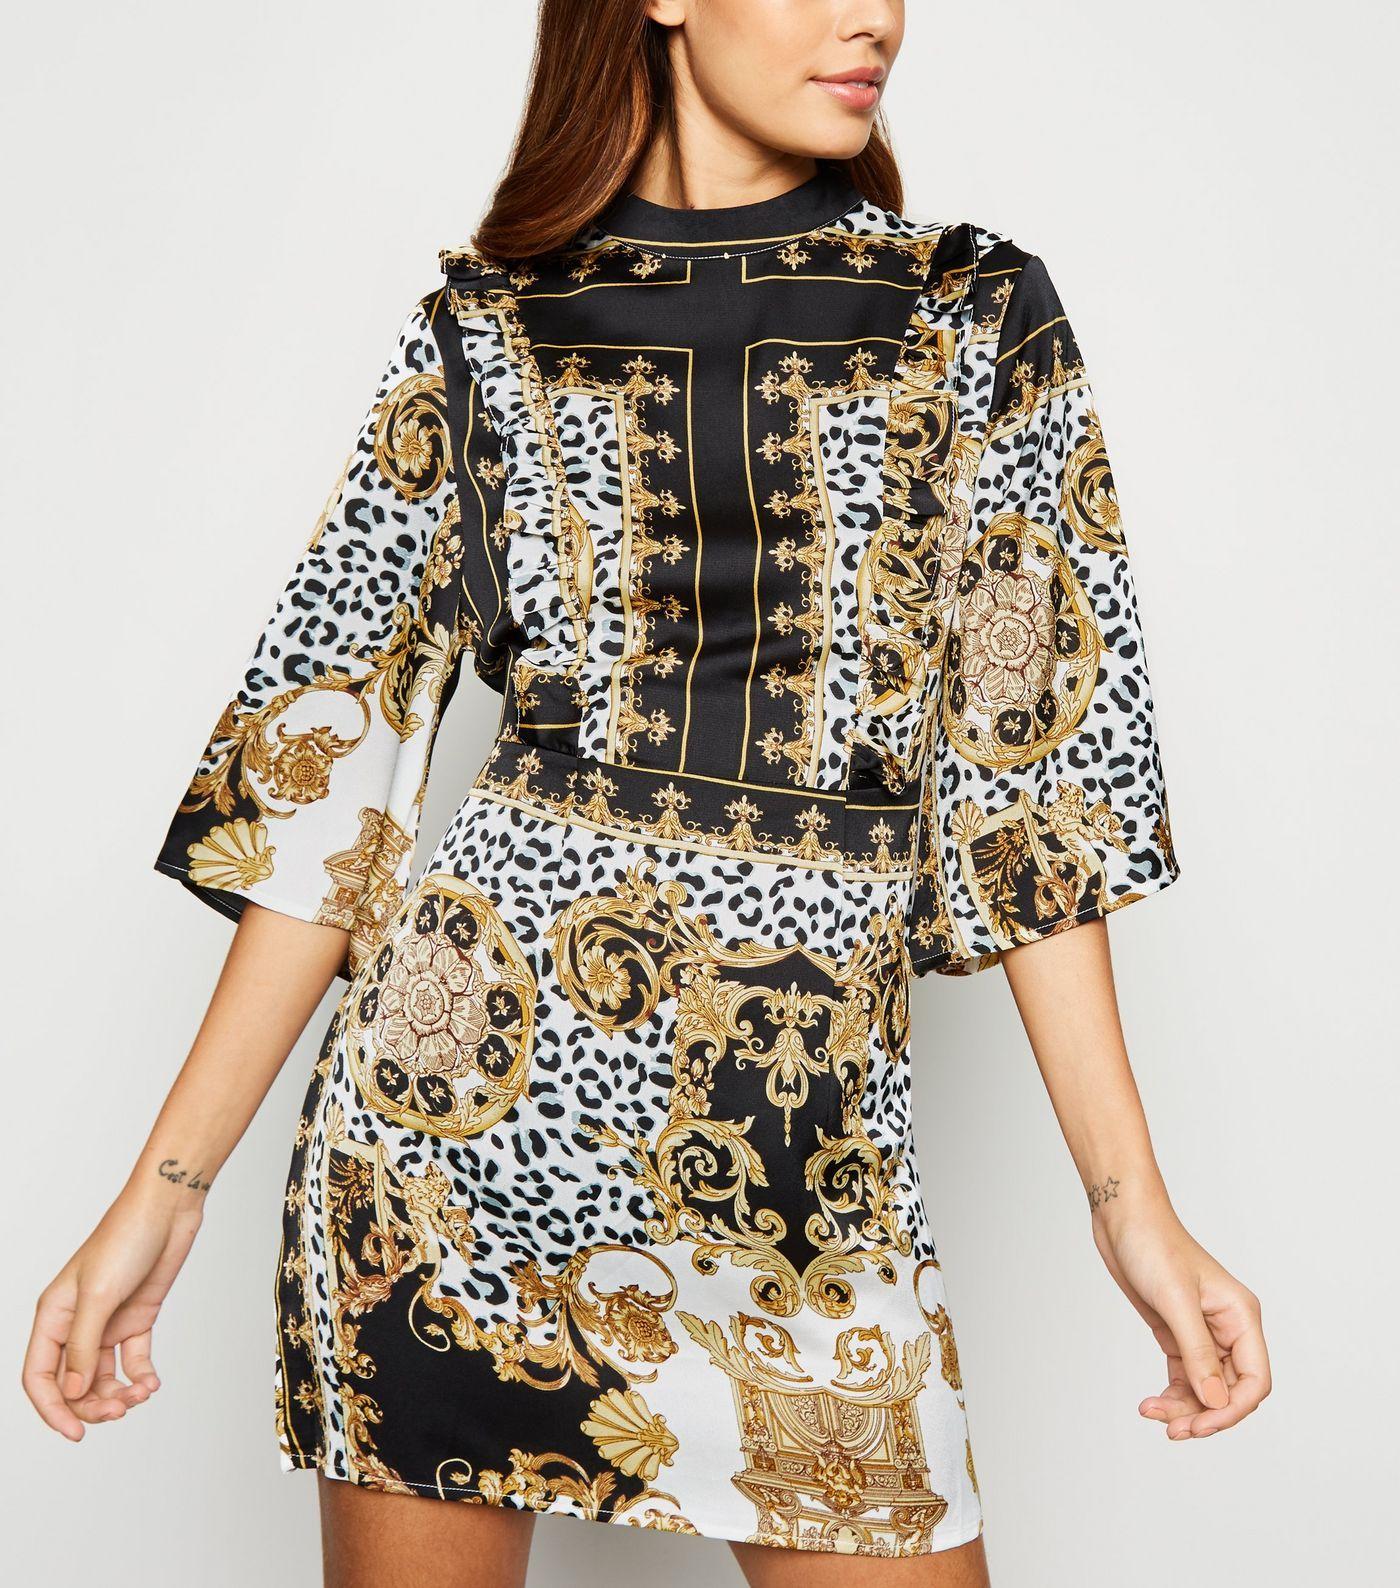 30bc767188 AX Paris Black Satin Chain Print Dress in 2019 | Dresses | Dresses ...